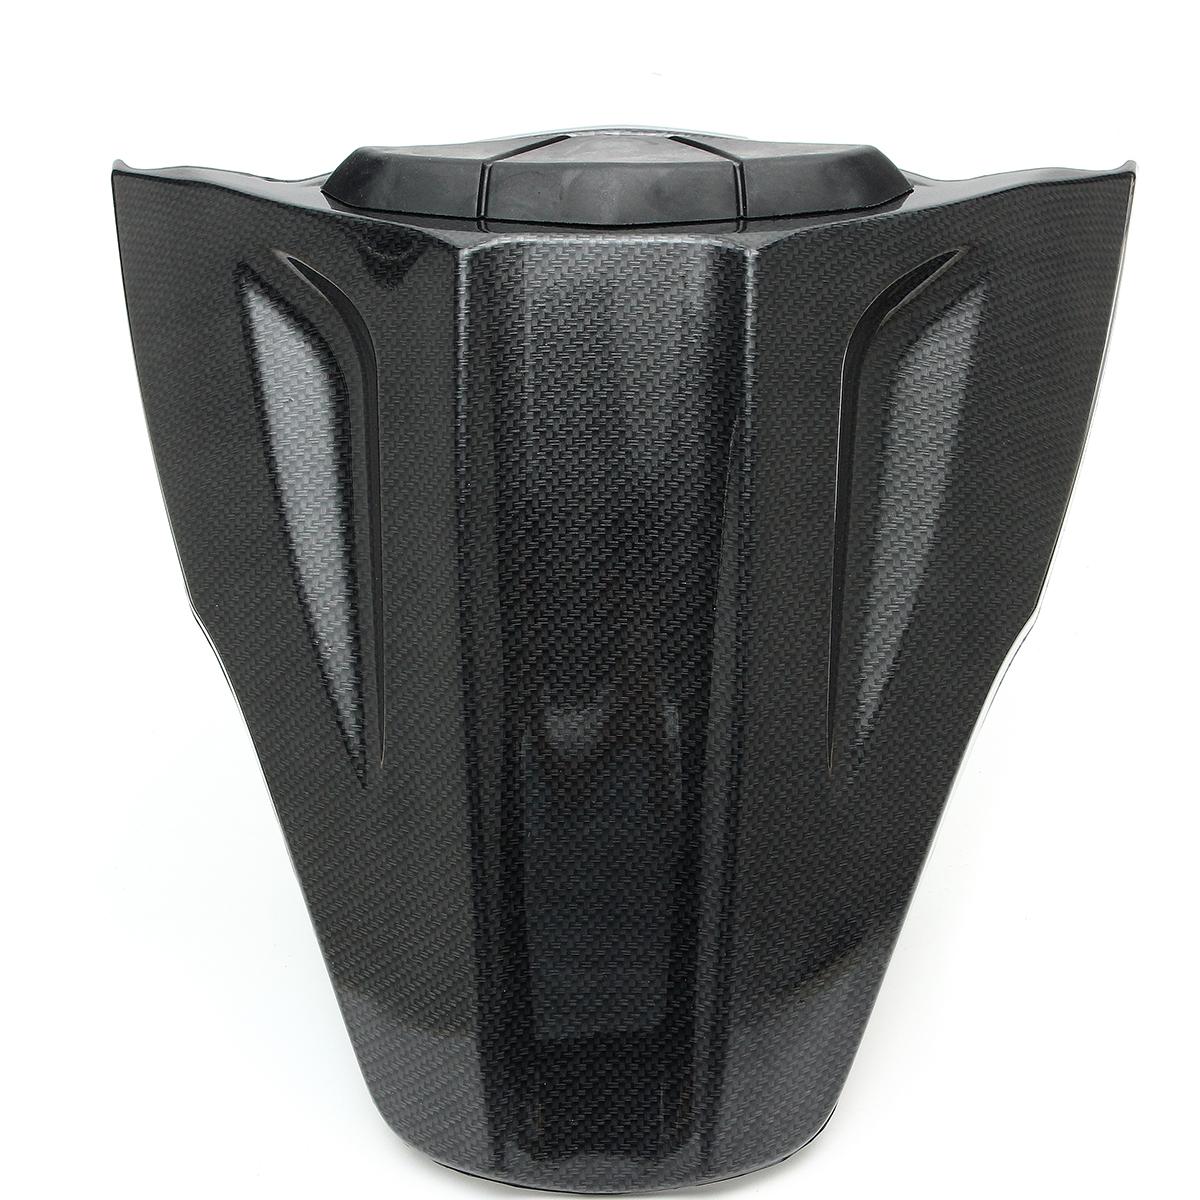 Rear Seat Cowl Fairing Cover For Kawasaki Ninja ZX10R 2011-2015 ABS Plastic